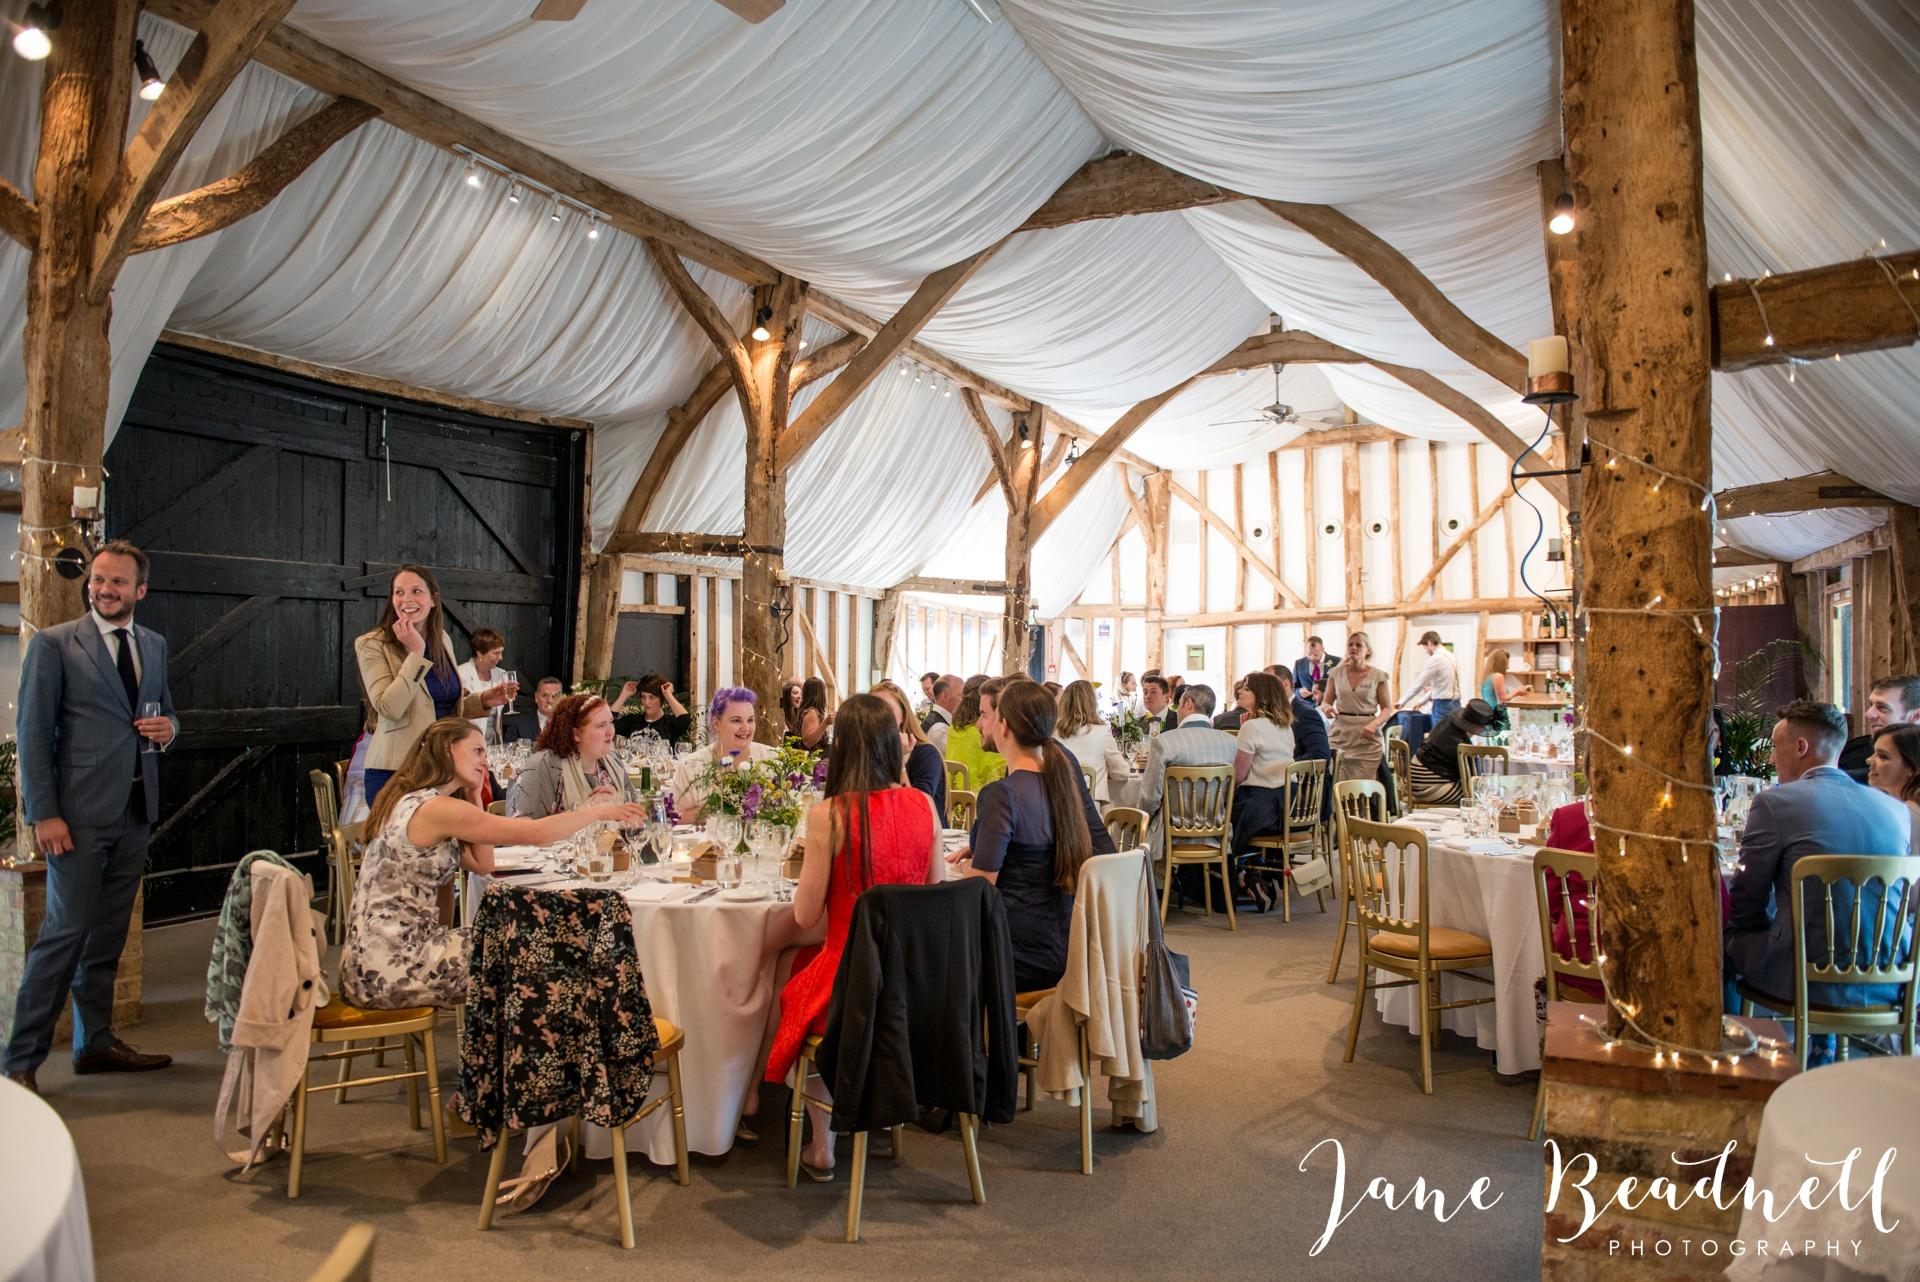 South Farm Wedding photography Hertfordshire by Jane Beadnell Photography fine art wedding photographer_0174